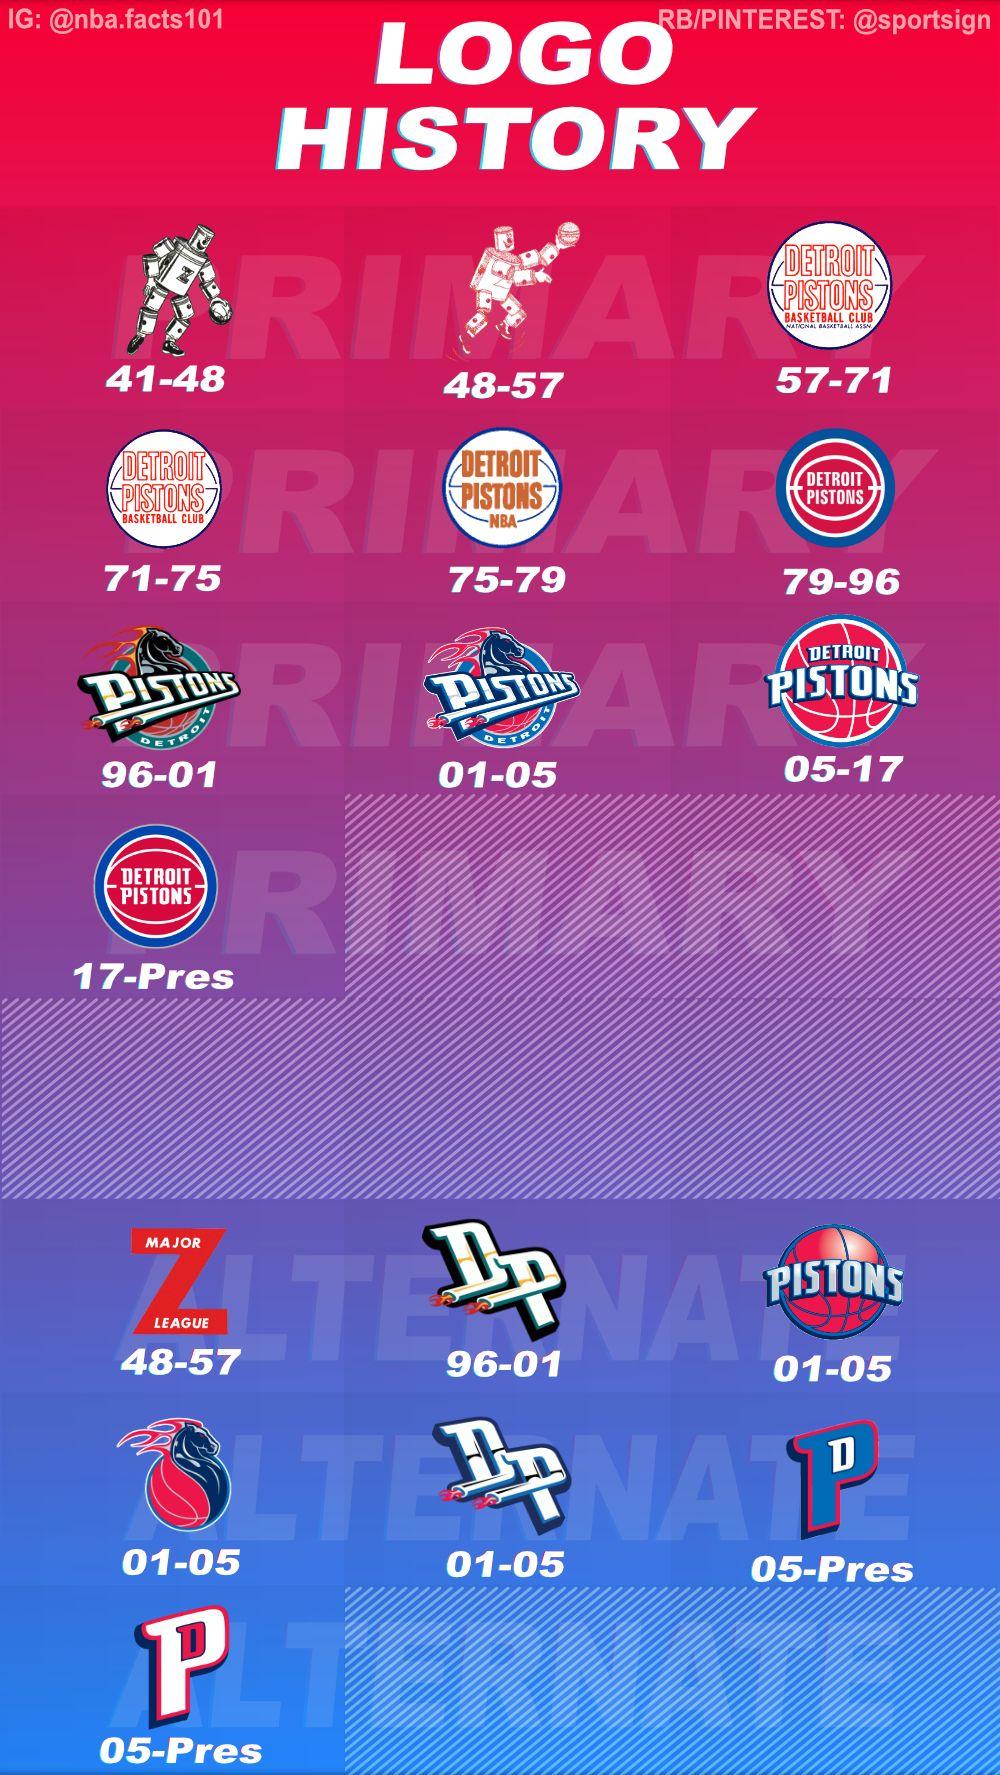 History of the NBA Basketball Detroit Pistons Logos